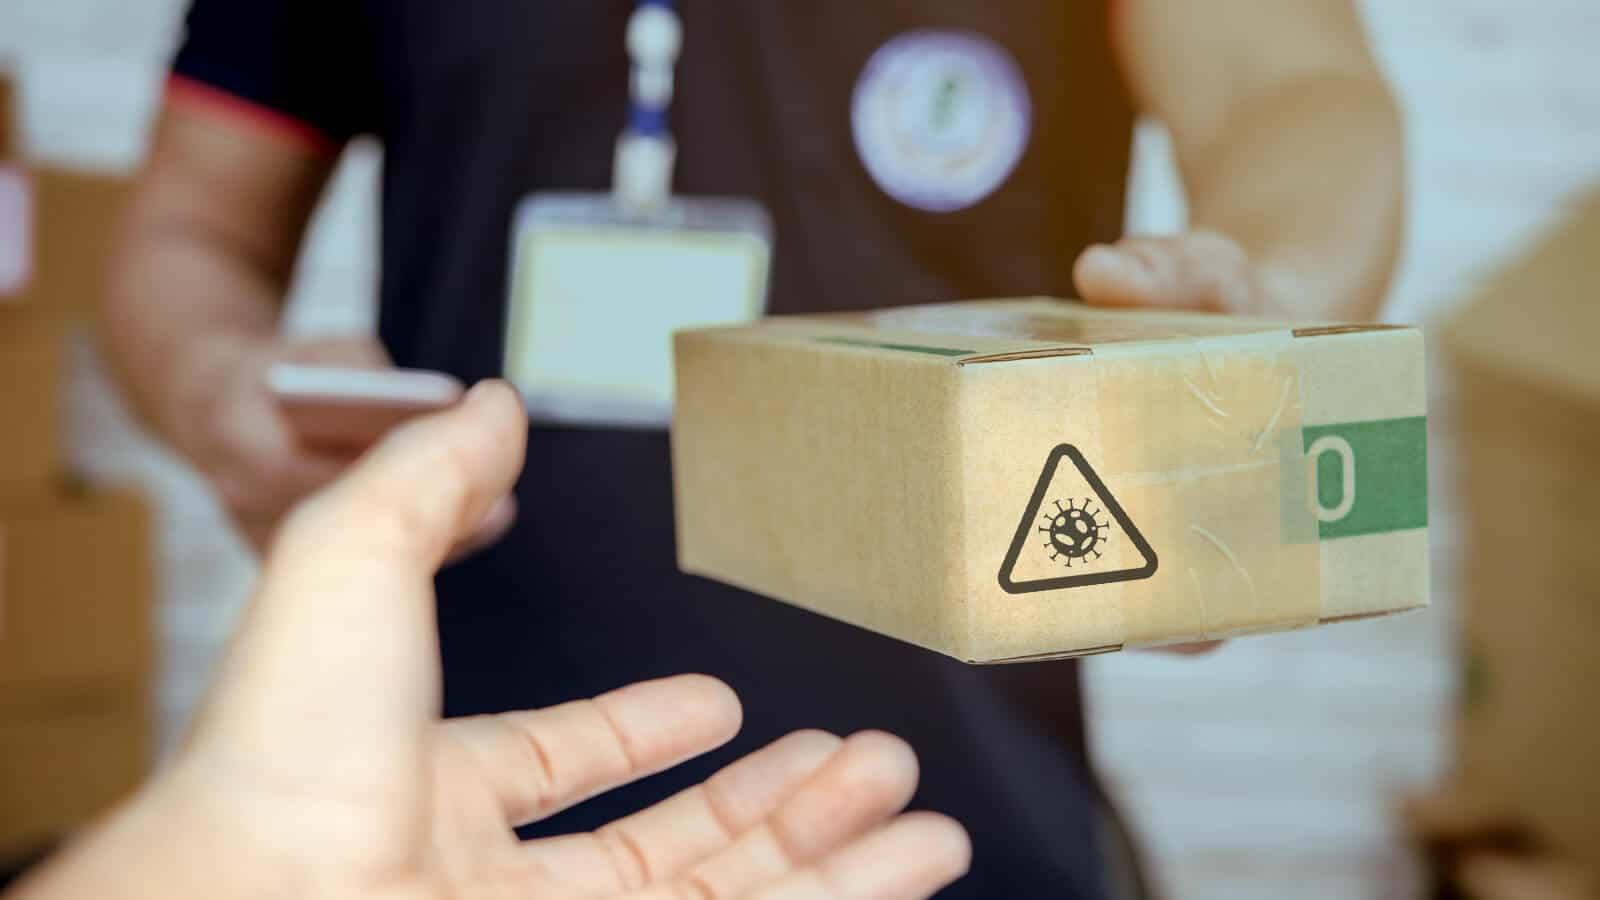 Paket mit Corona-Warnsymbol wird übergeben